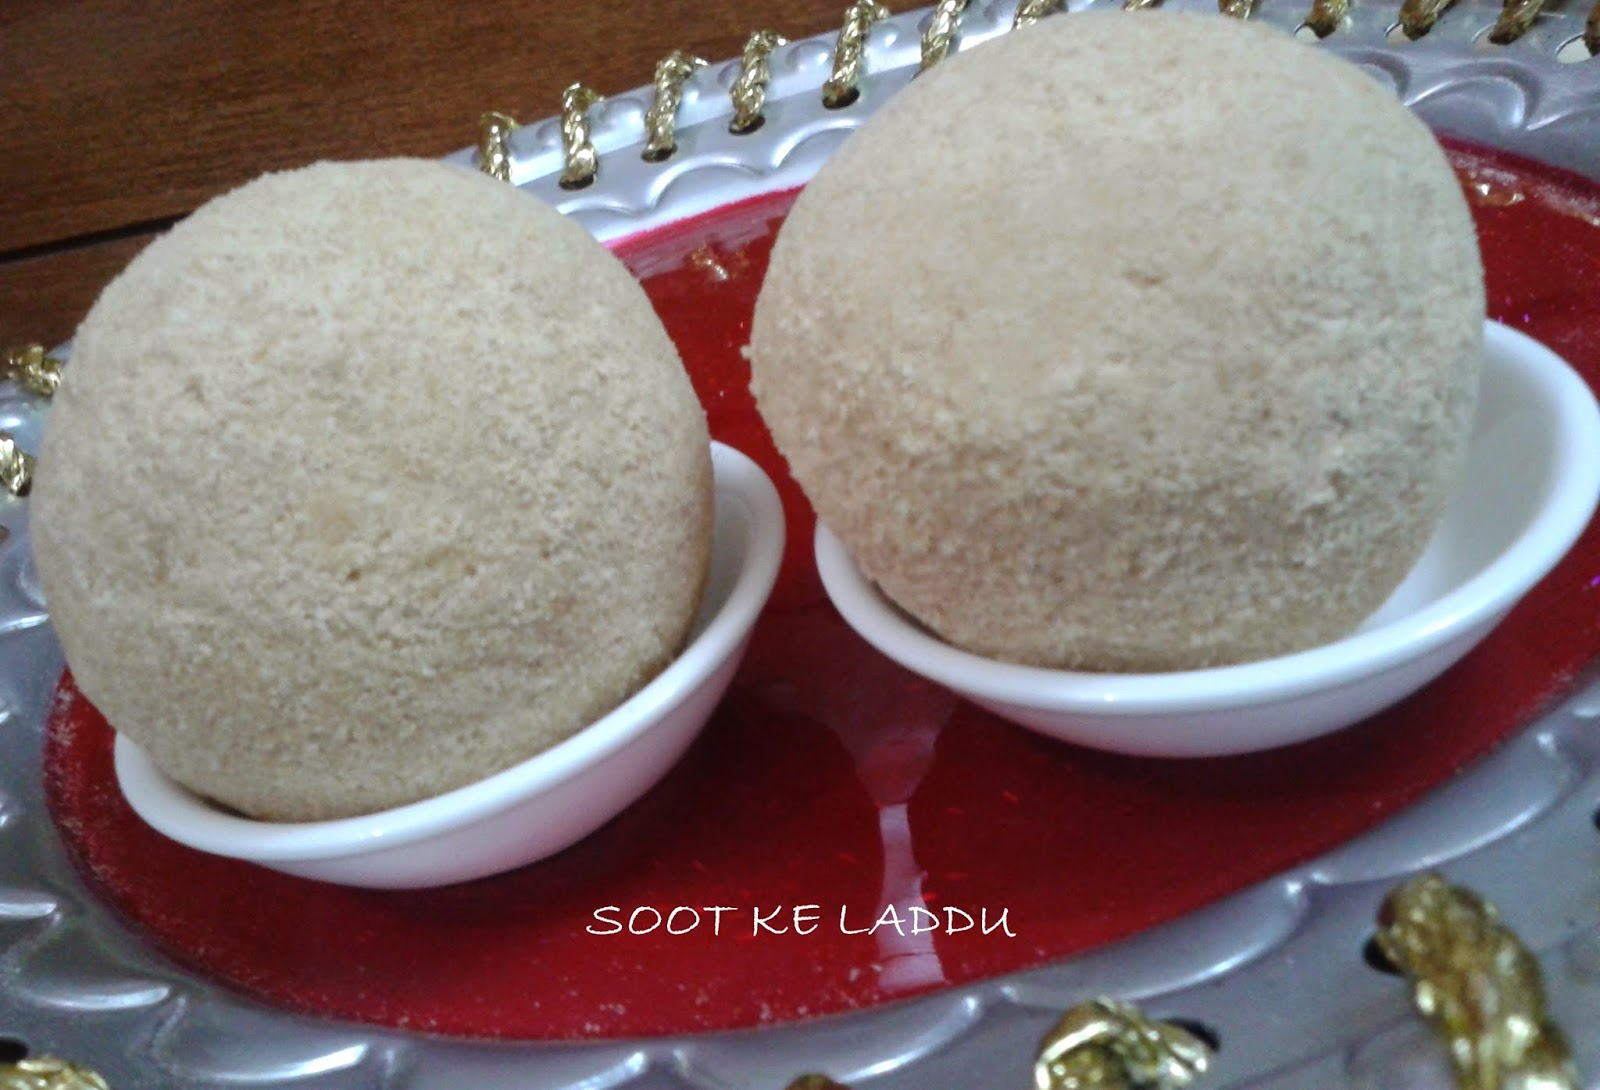 http://www.paakvidhi.com/2014/10/soot-ke-laddu.html